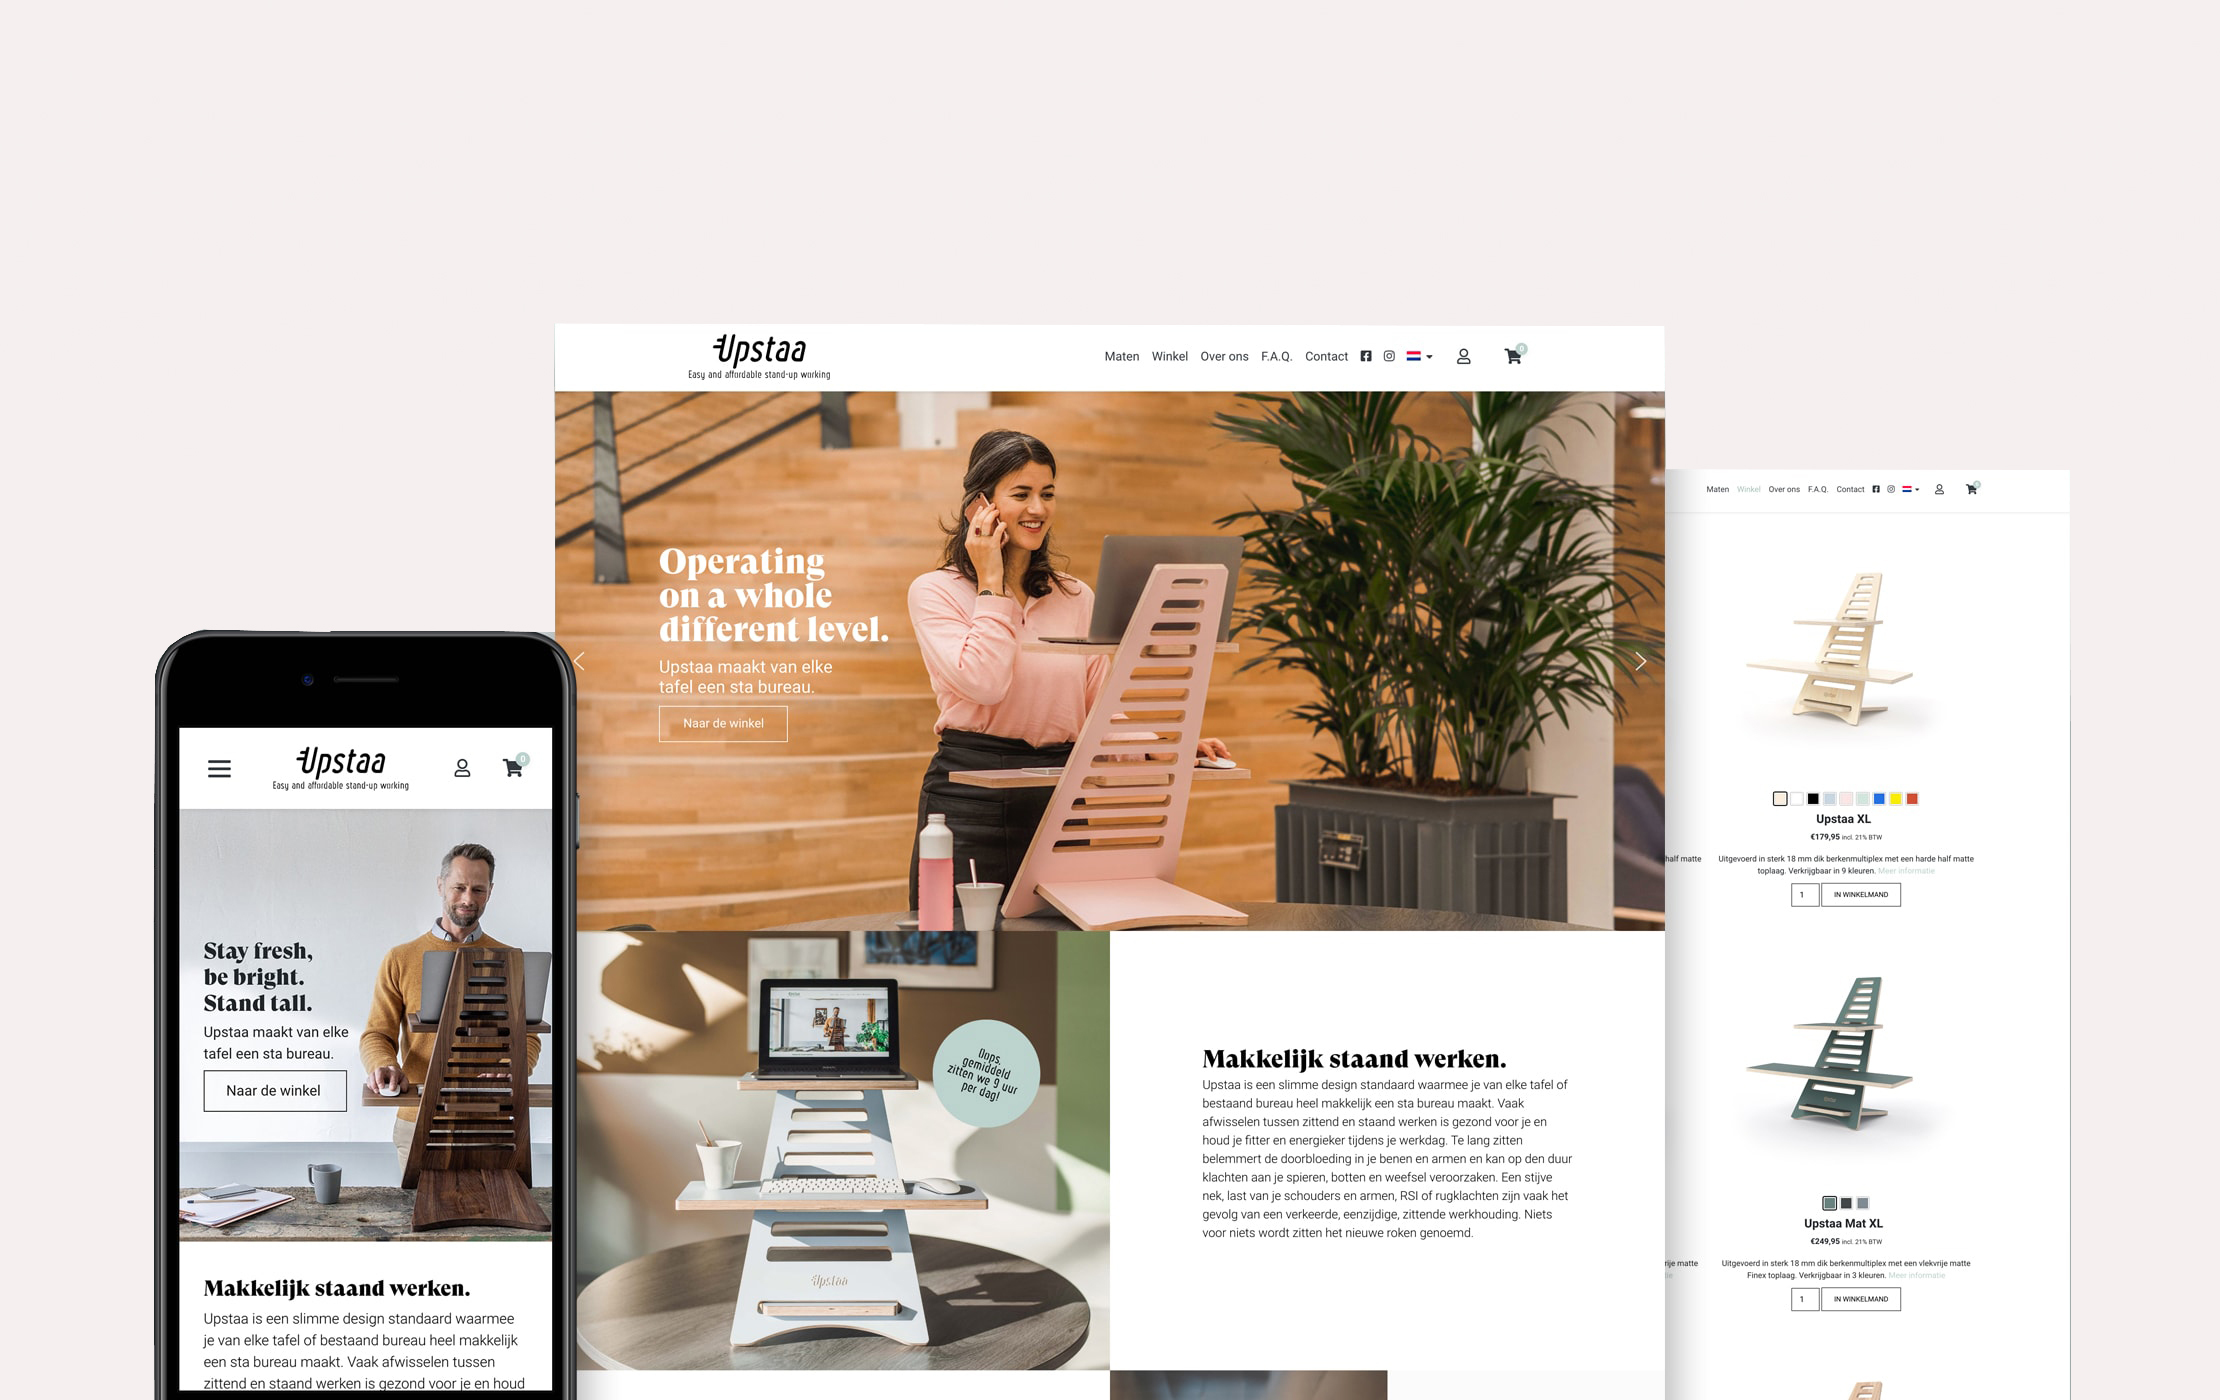 webshop-woocommerce-ecommerce-wordpress-dreamlab_portfolio_upstaa